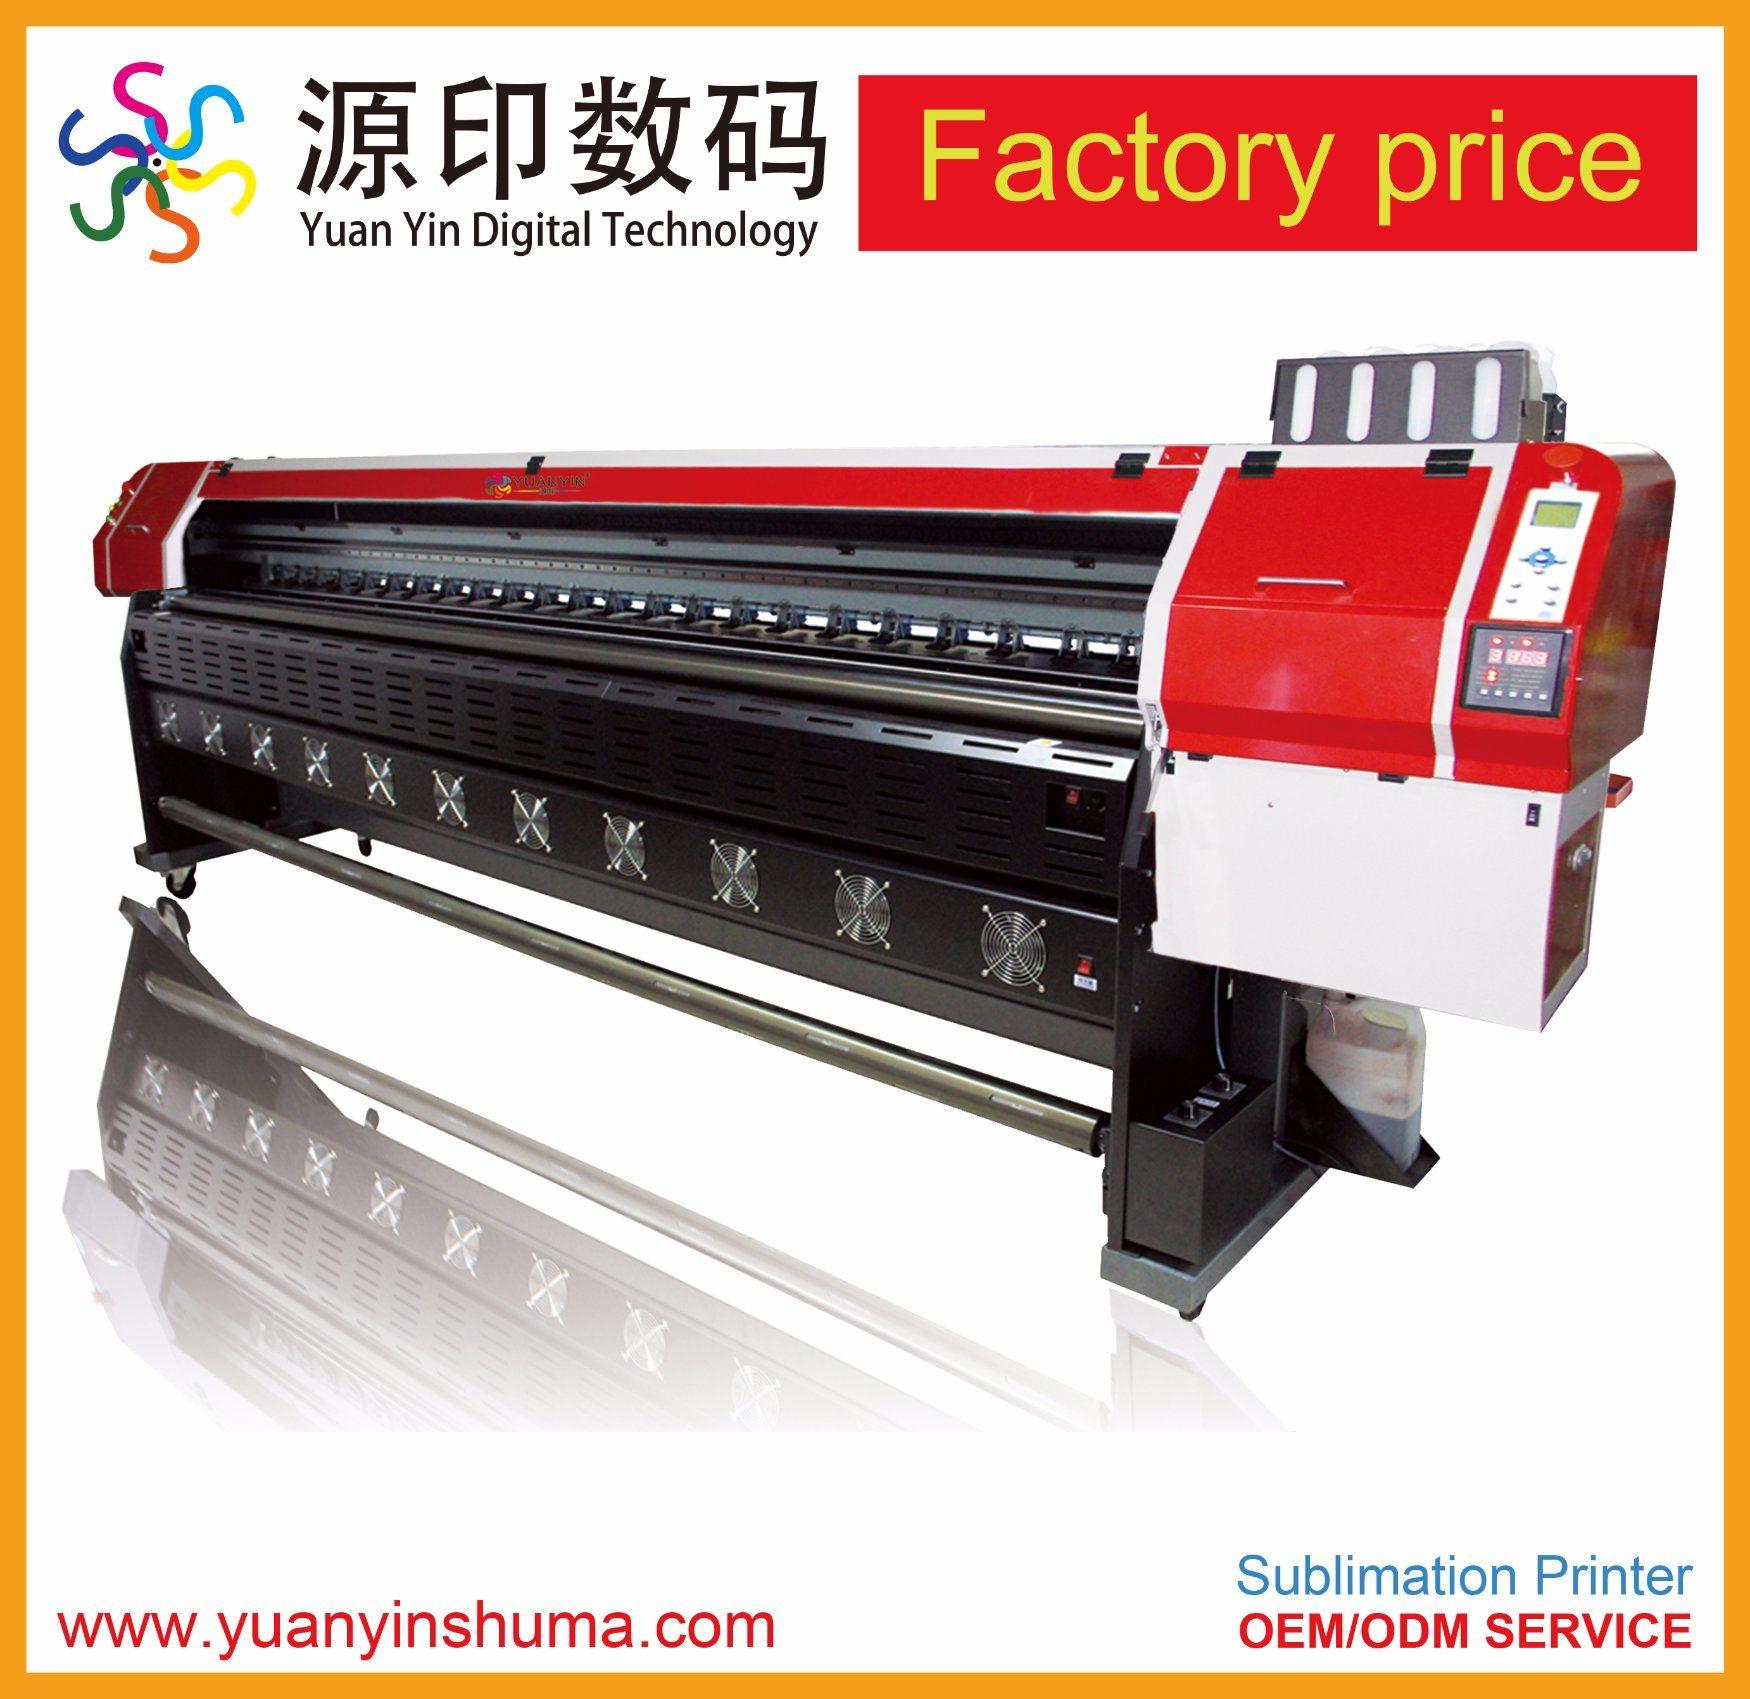 Epson T Shirt Printing Machine Price - Ortsplanungsrevision